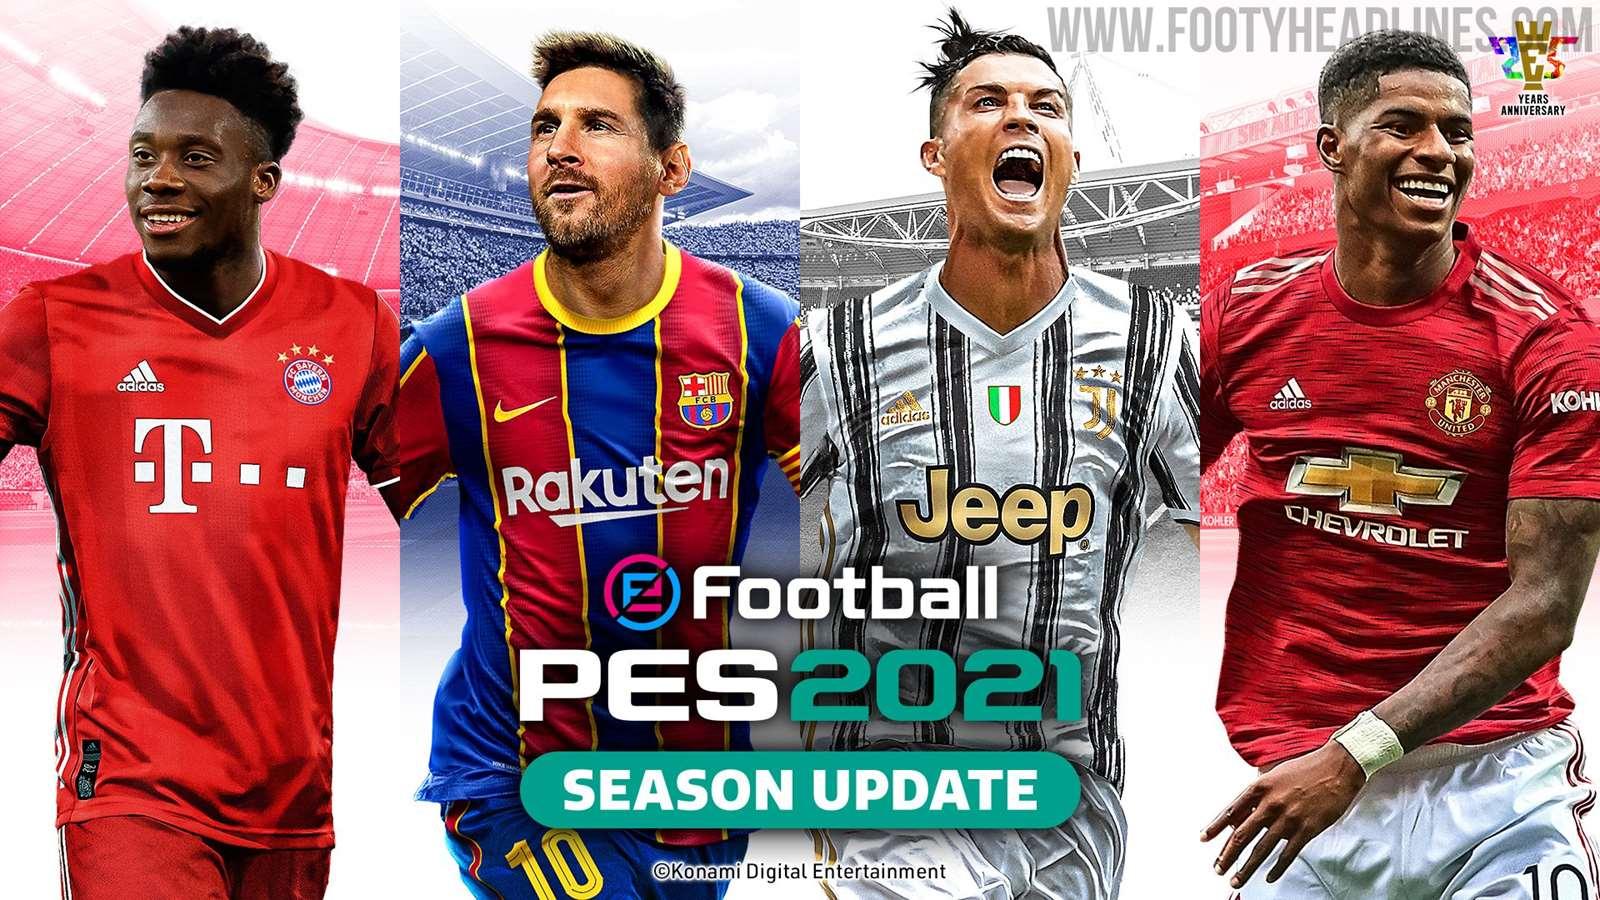 Messi Ronaldo Pes 2021 Cover Revealed Footy Headlines